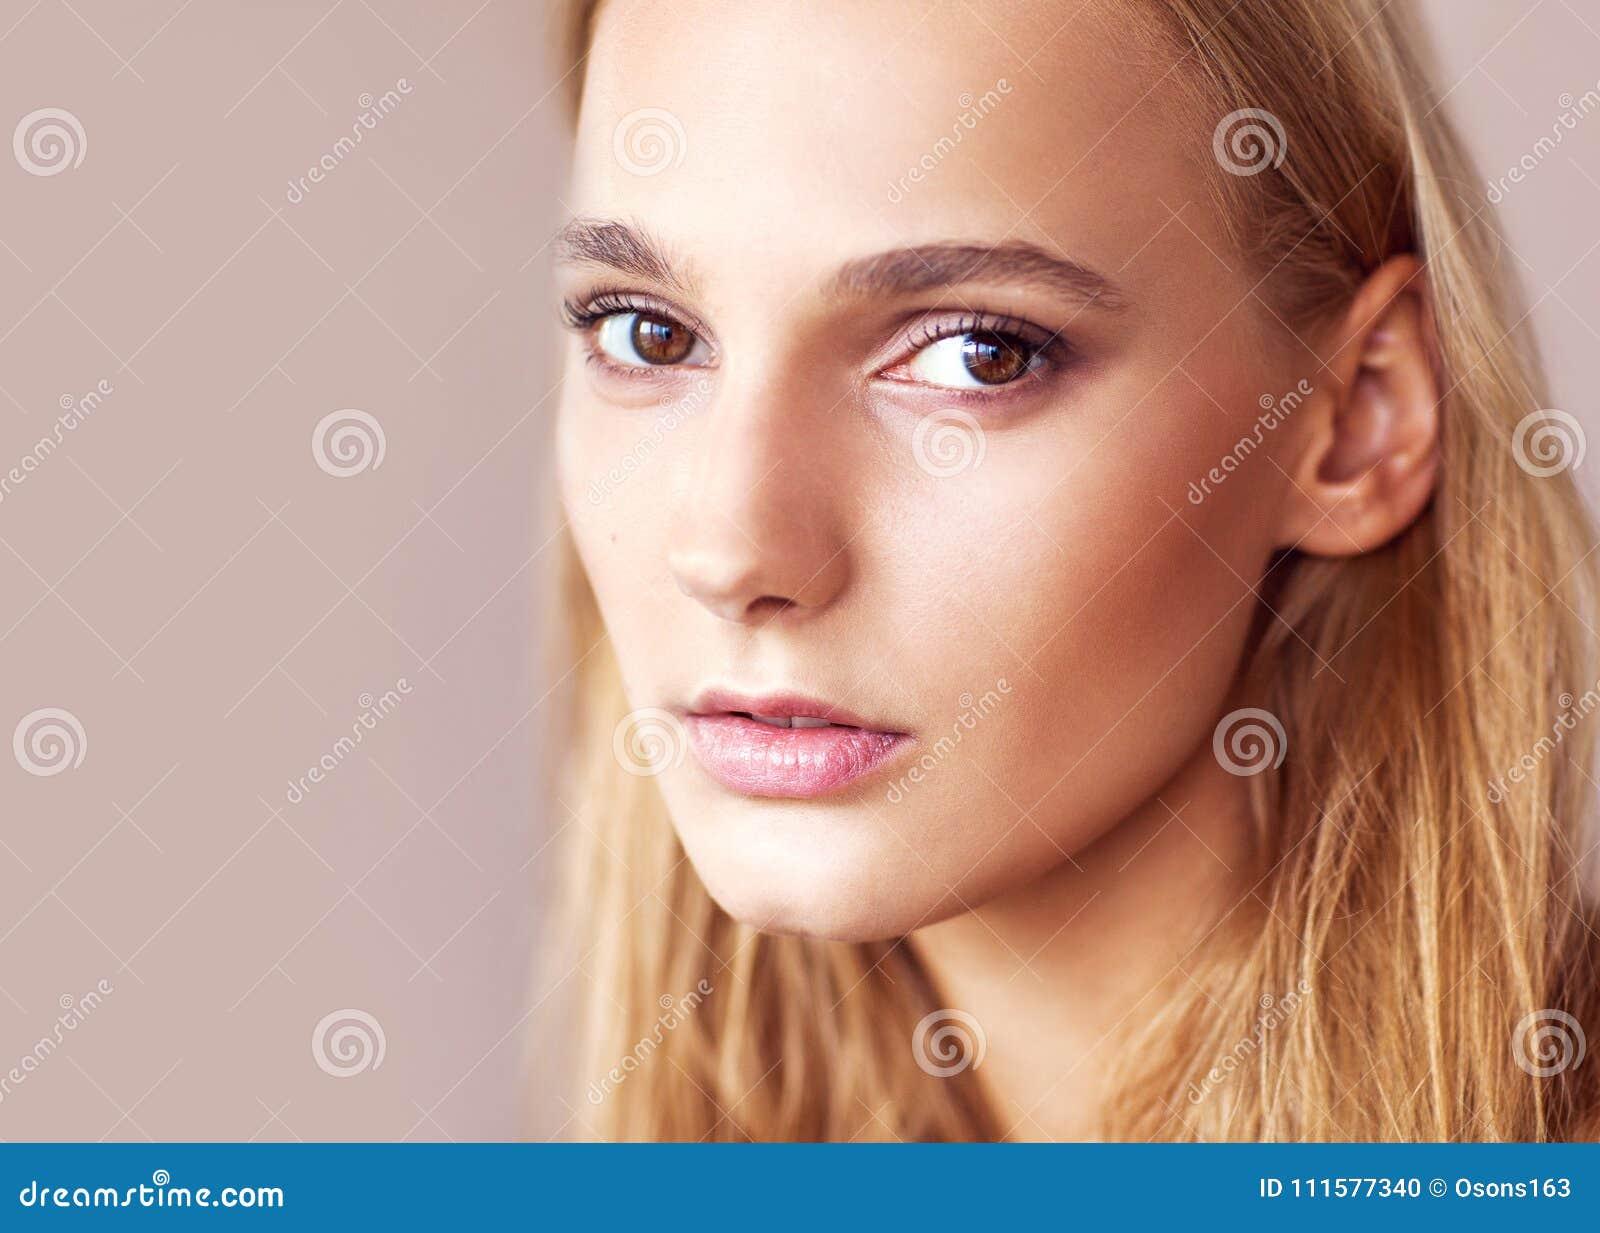 Happy Beautiful Girl. Nude Fashion Portrait Of A White